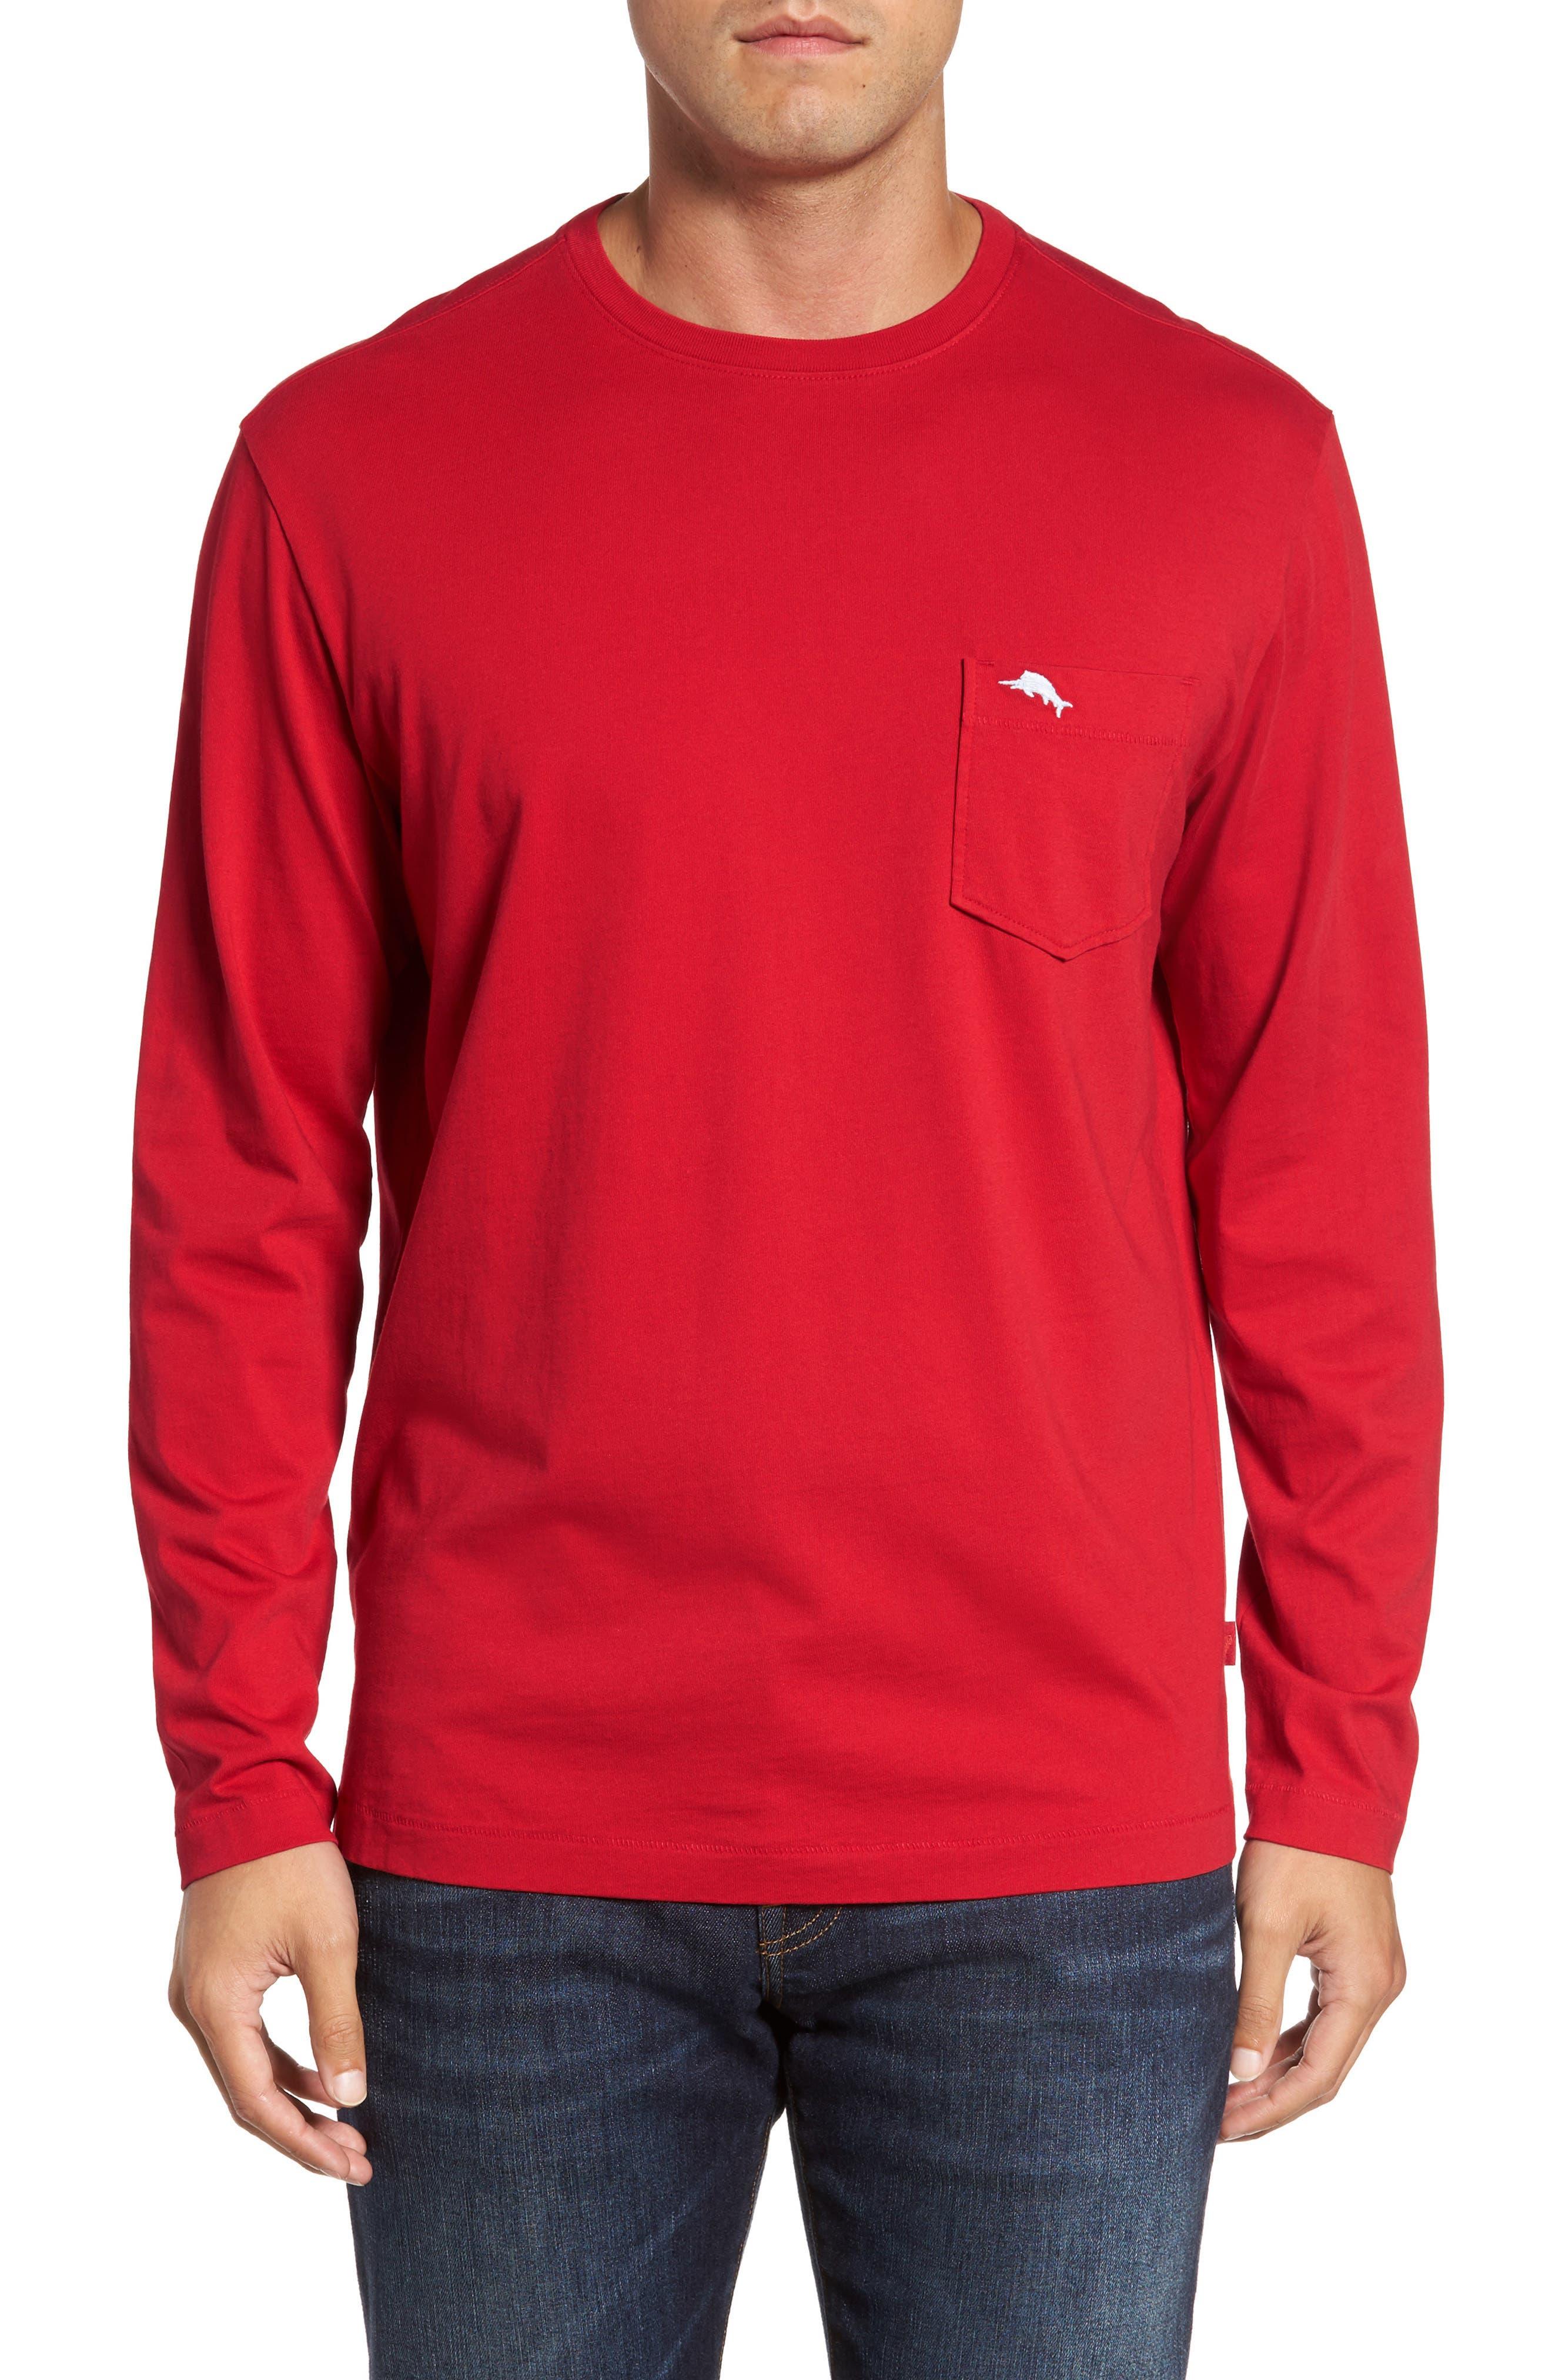 Main Image - Tommy Bahama Bali Skyline Long Sleeve Pima Cotton T-Shirt